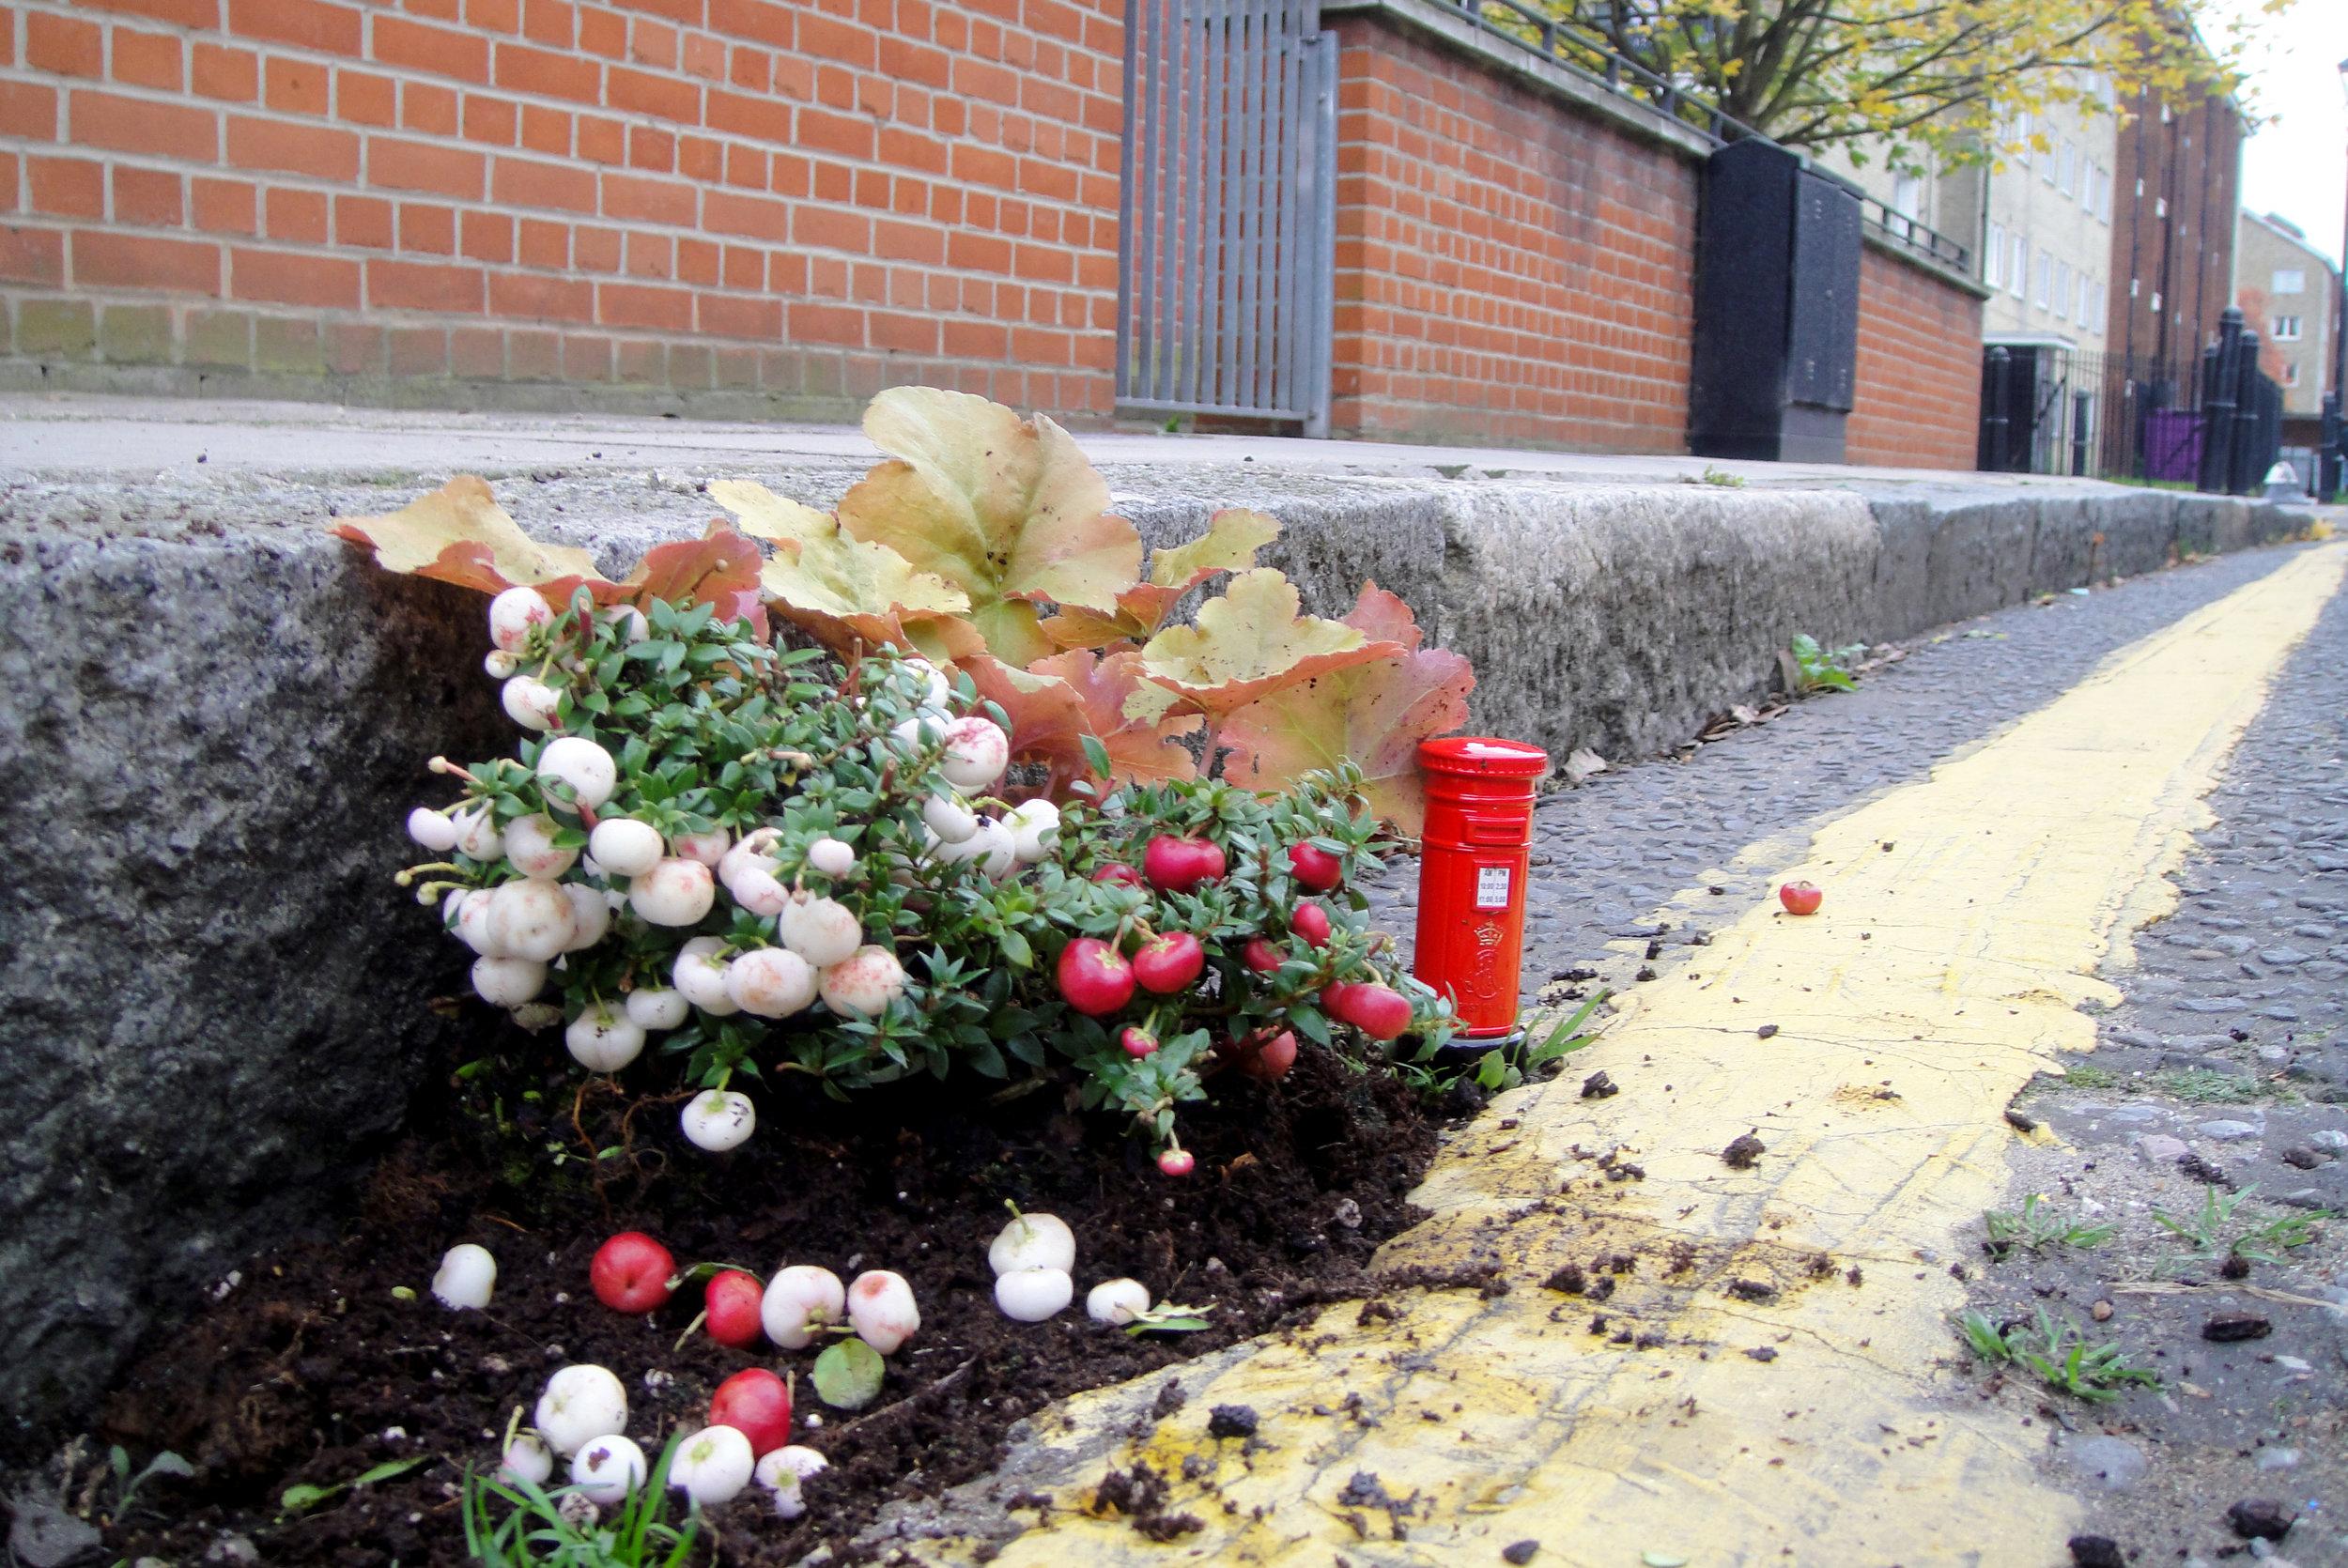 pothole-garden-royal-post-post-box-east-london.jpg